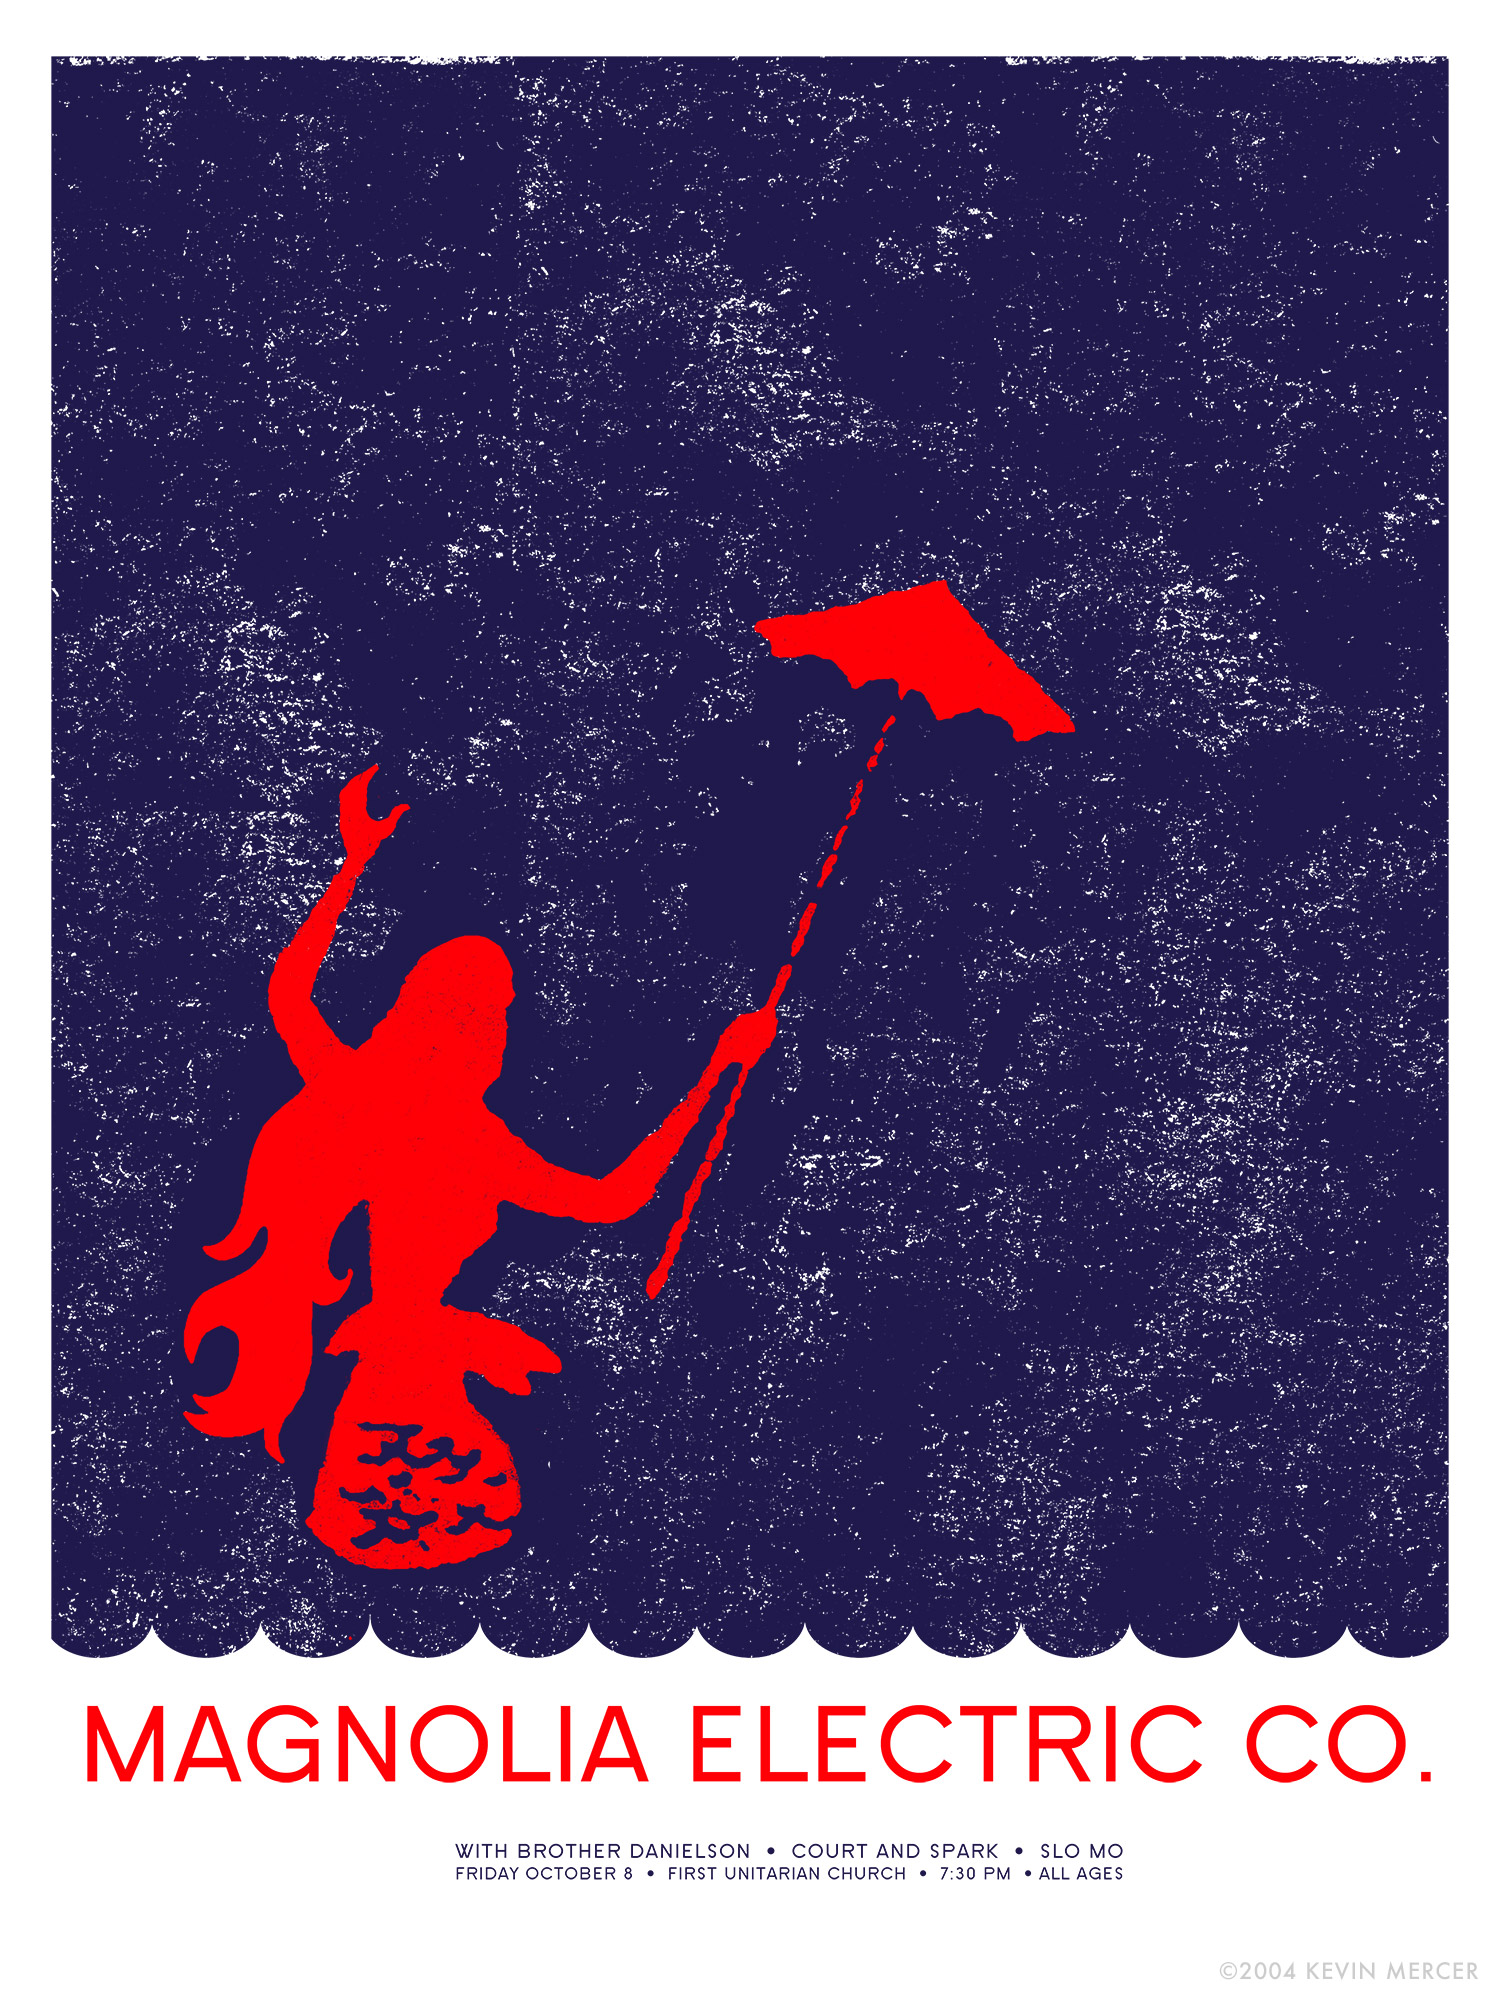 MagnoliaElectricCo2003-1500.jpg